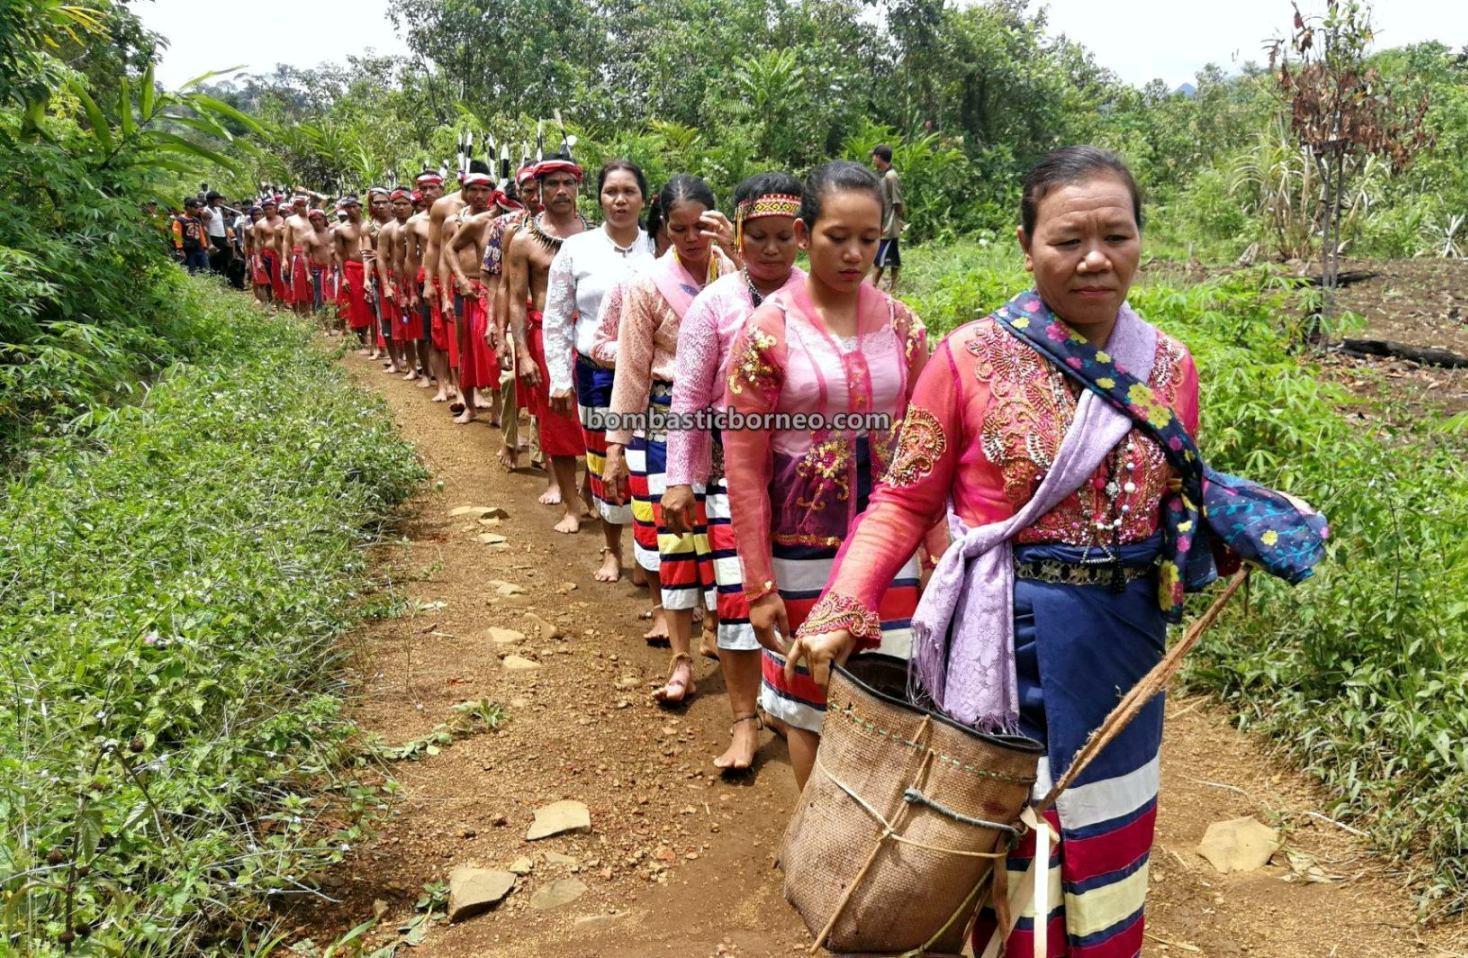 Nyobeng Rambai, Paddy Harvest Festival, authentic, village, backpackers, Indonesia, Kalimantan Barat, Bengkayang, Desa Sahan, Dayak Bidayuh, Native, indigenous, Tourism, travel guide, cross border, Borneo